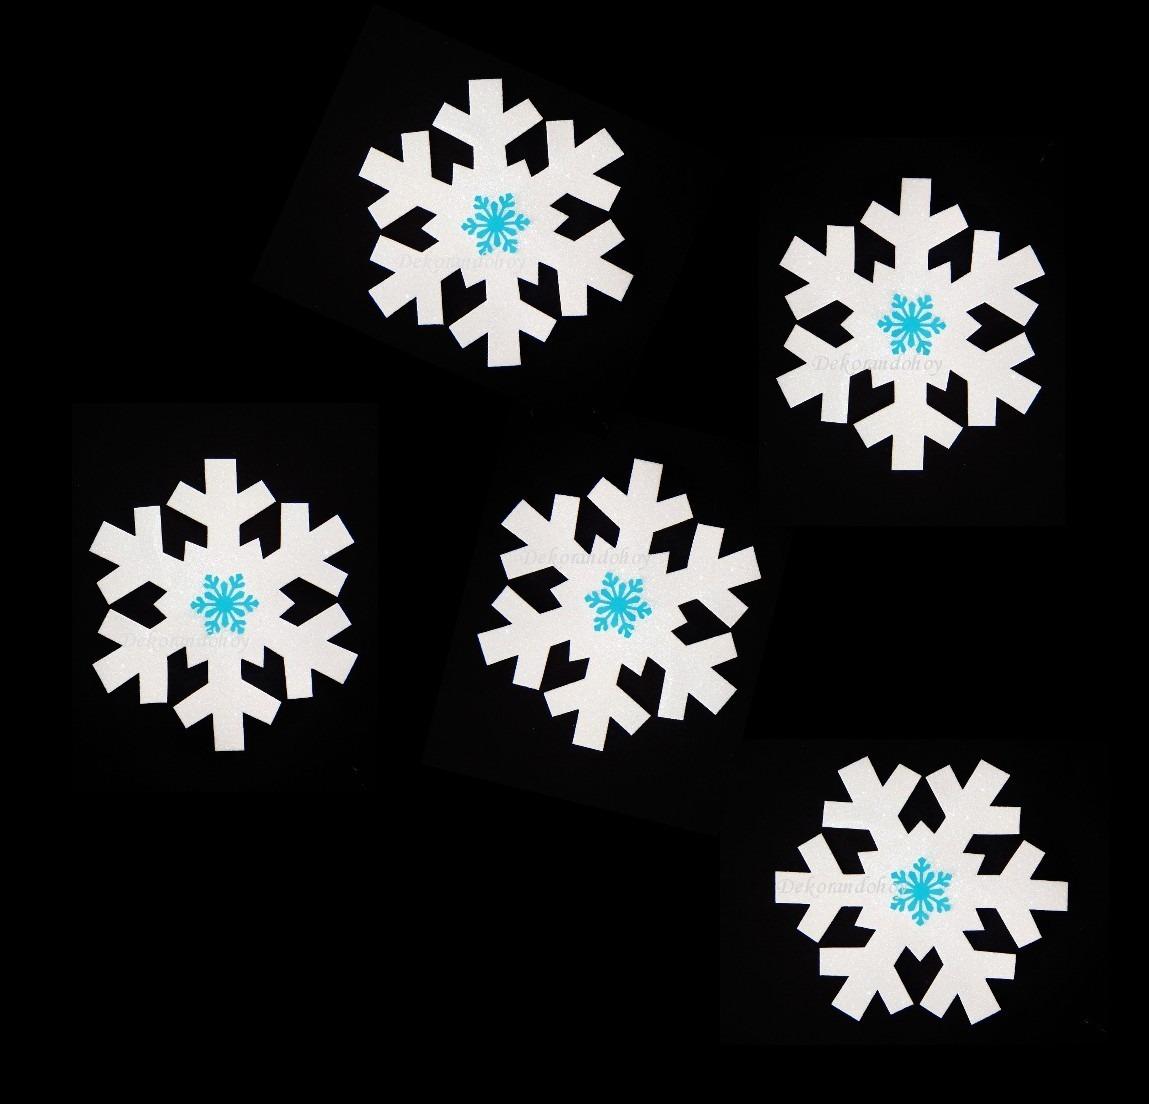 Copos nieve frozen goma eva foamy adorno navidad - Adornos navidenos de goma eva ...